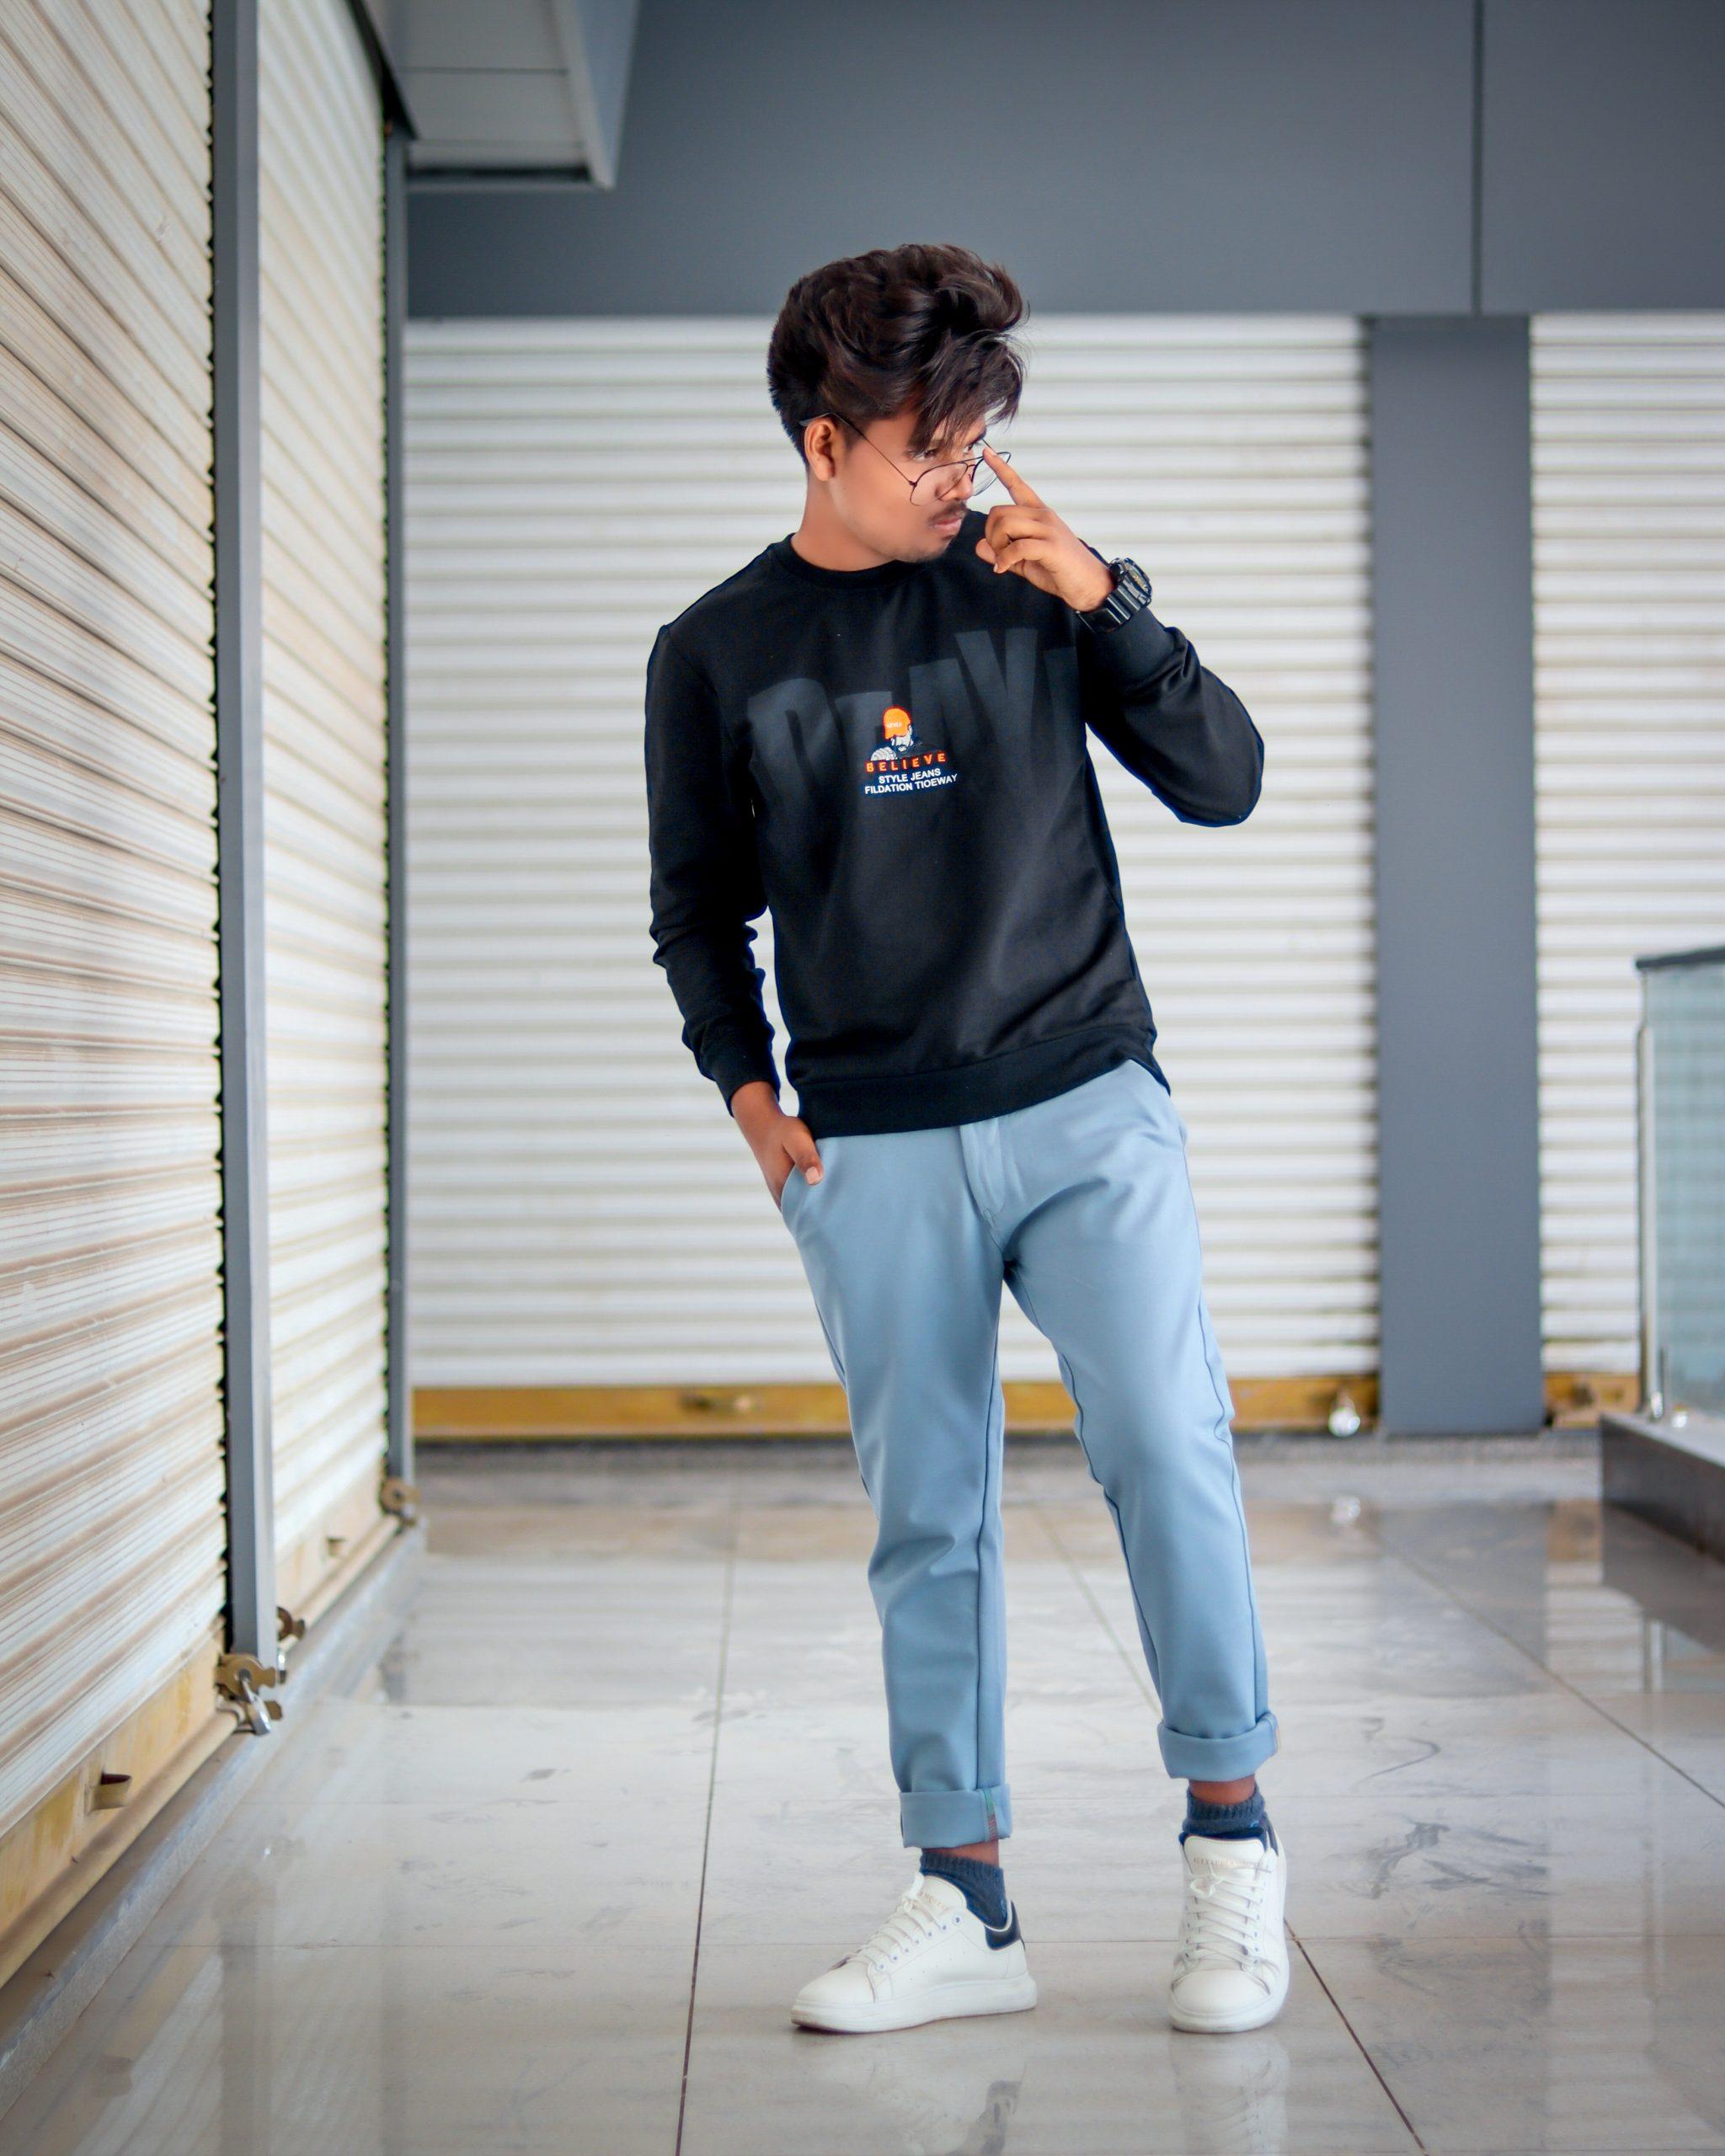 Boy posing with specs